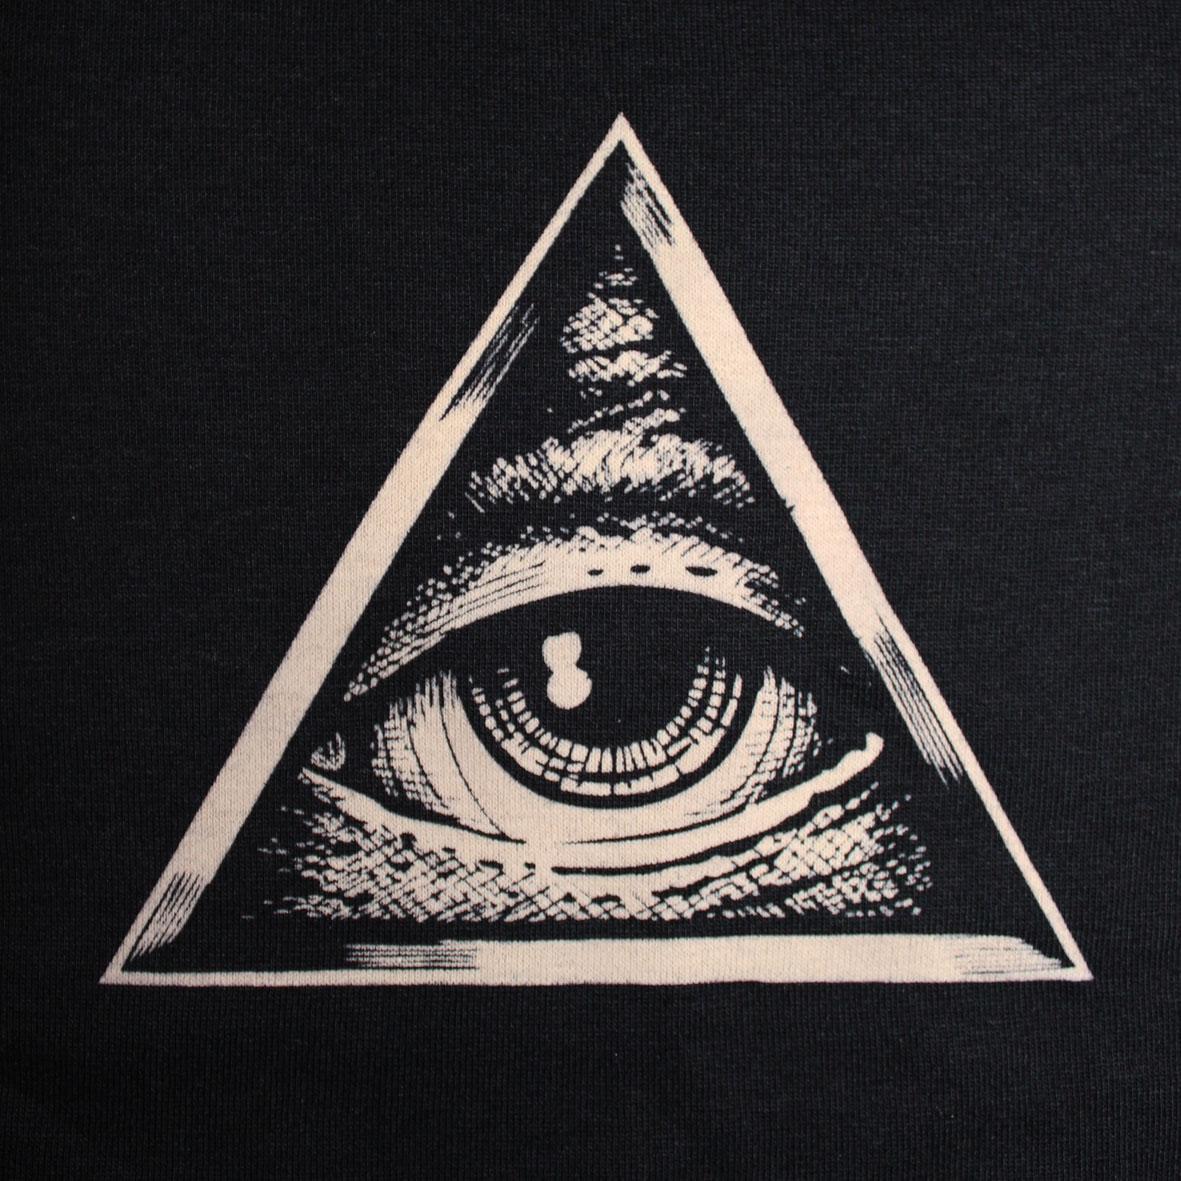 Pin By Emii Sadobe On Illuminati Rt